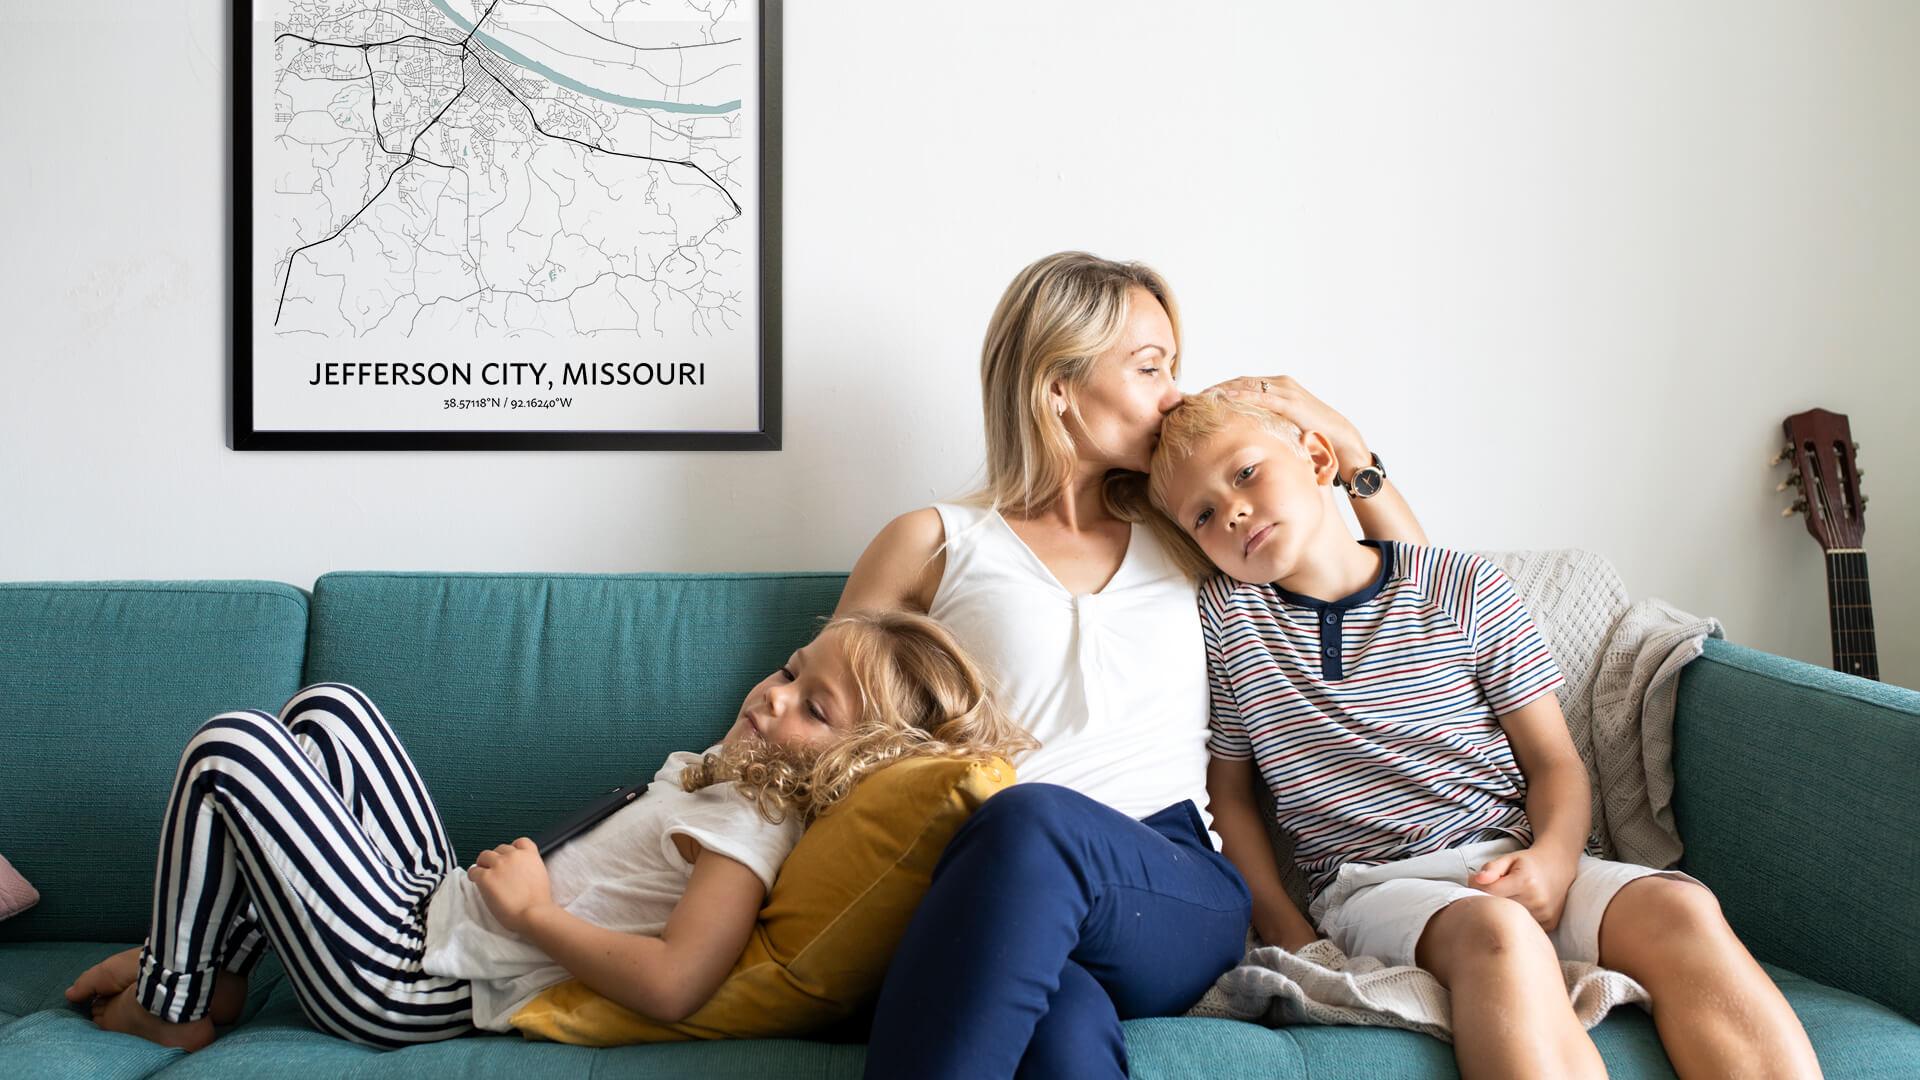 Jefferson City map poster